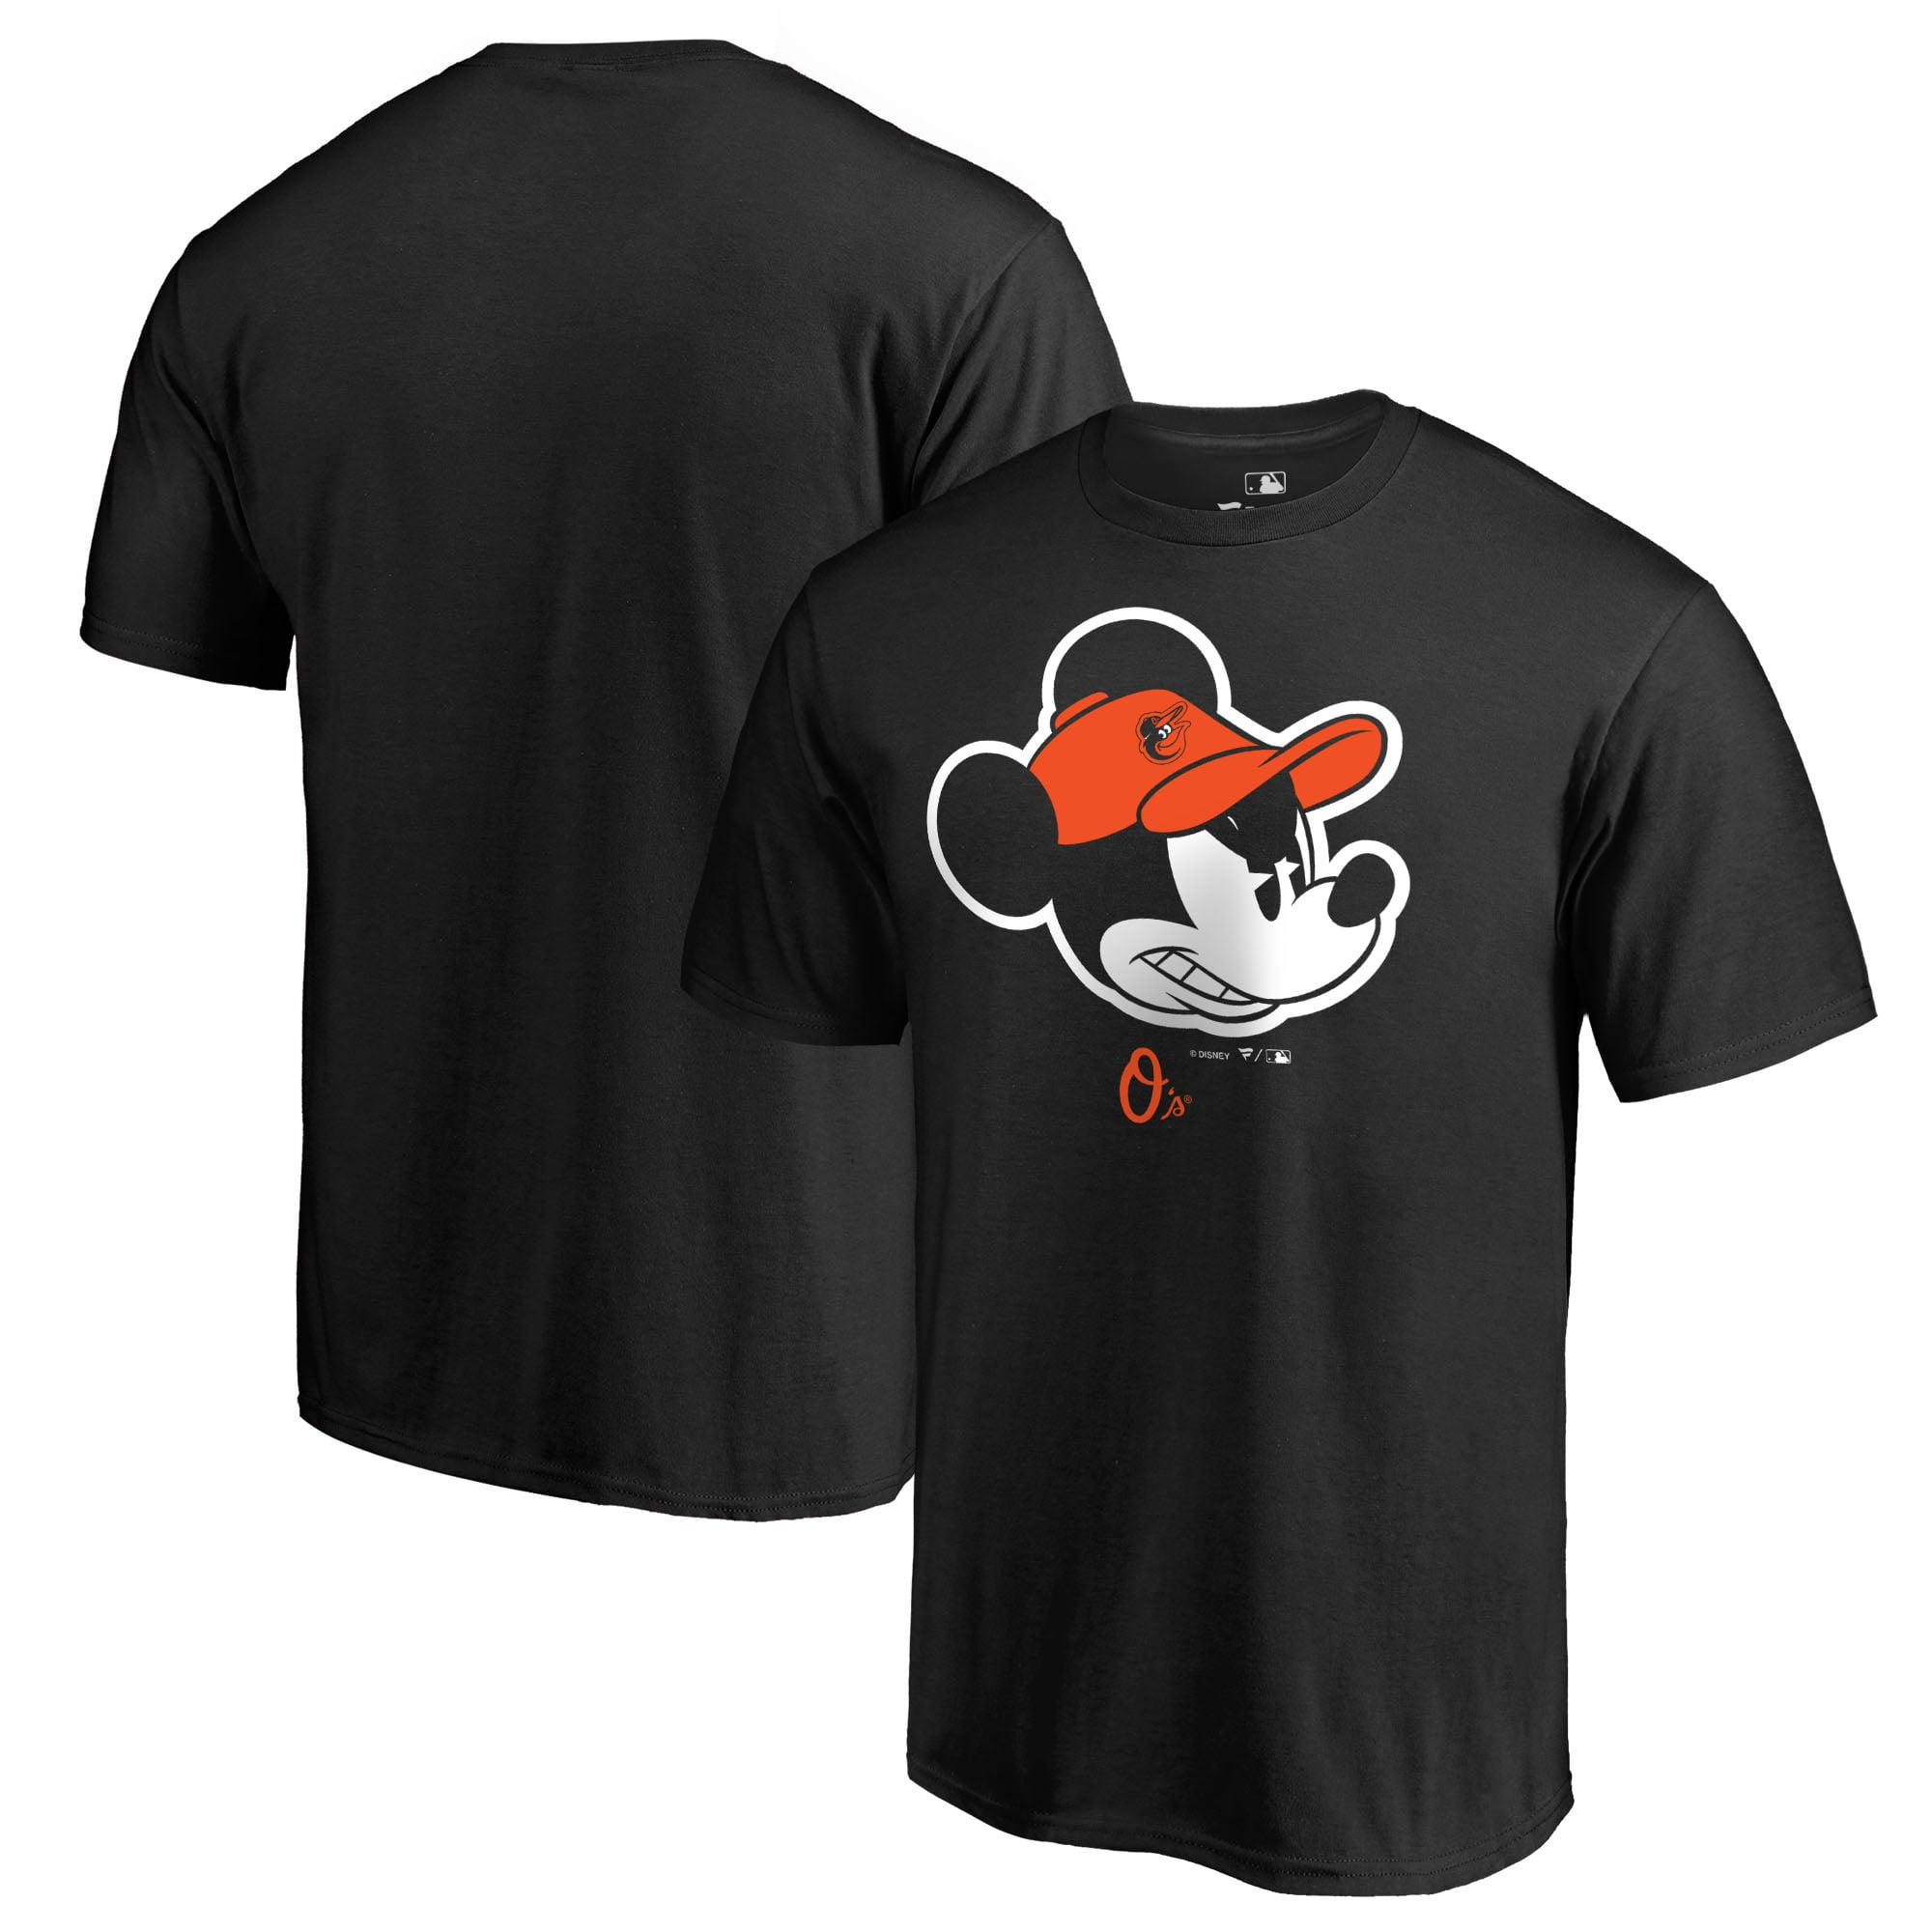 Baltimore Orioles Fanatics Branded Disney Game Face T-Shirt - Black